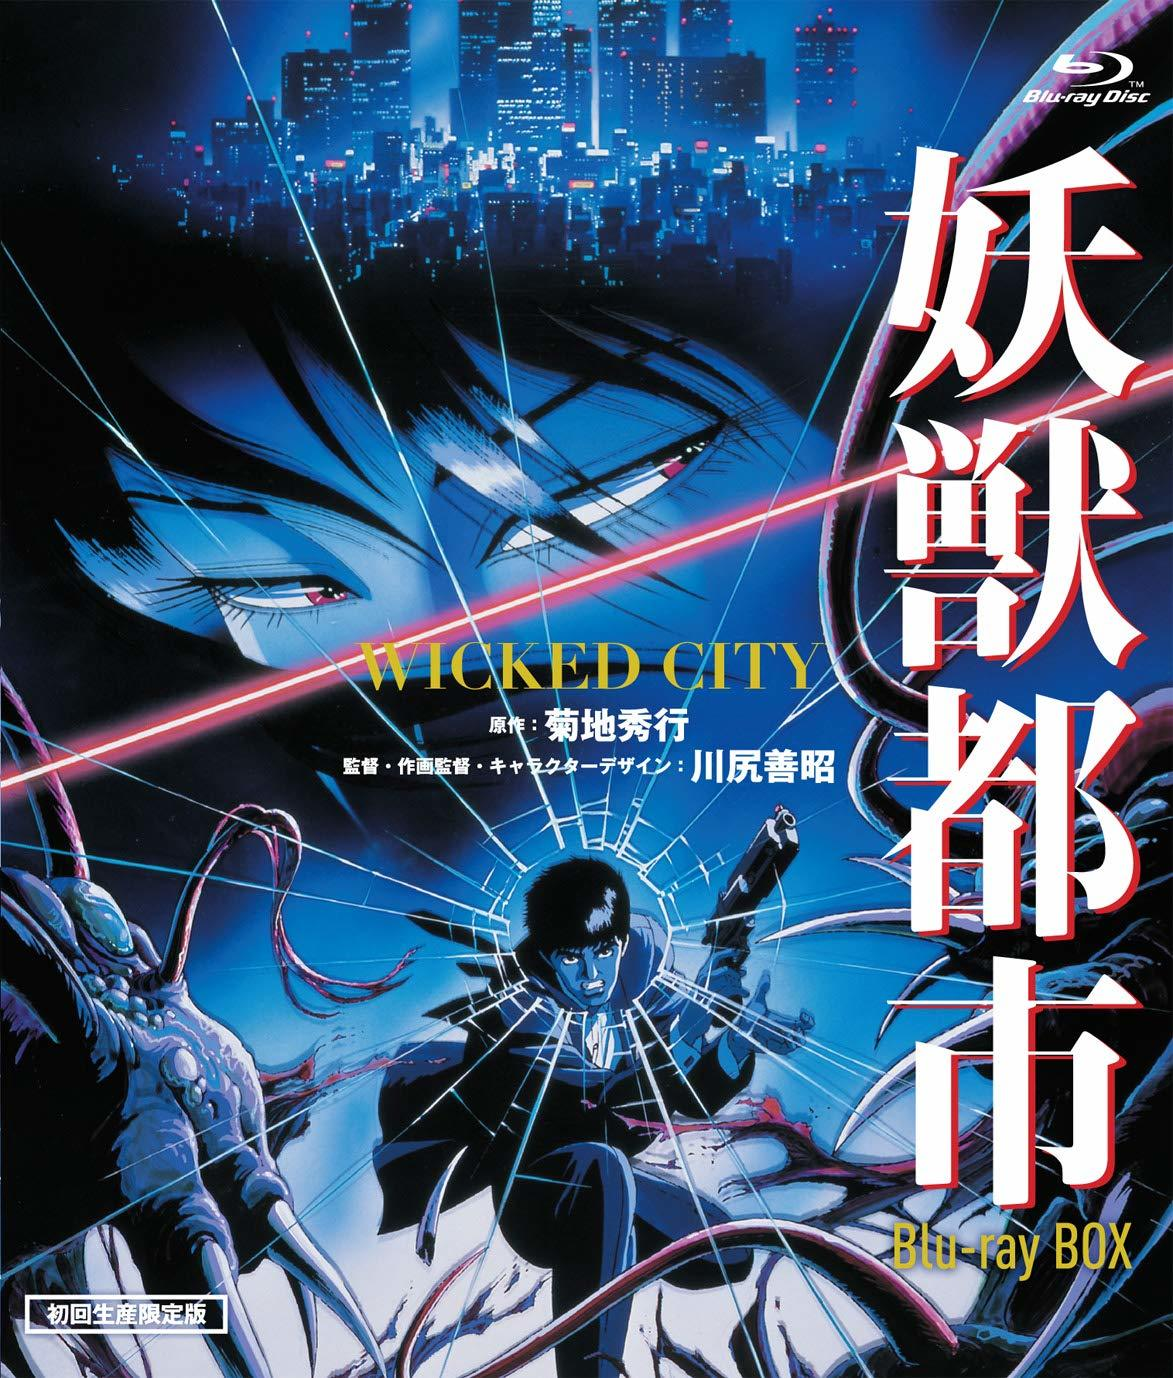 wicked city 1987 subtitles